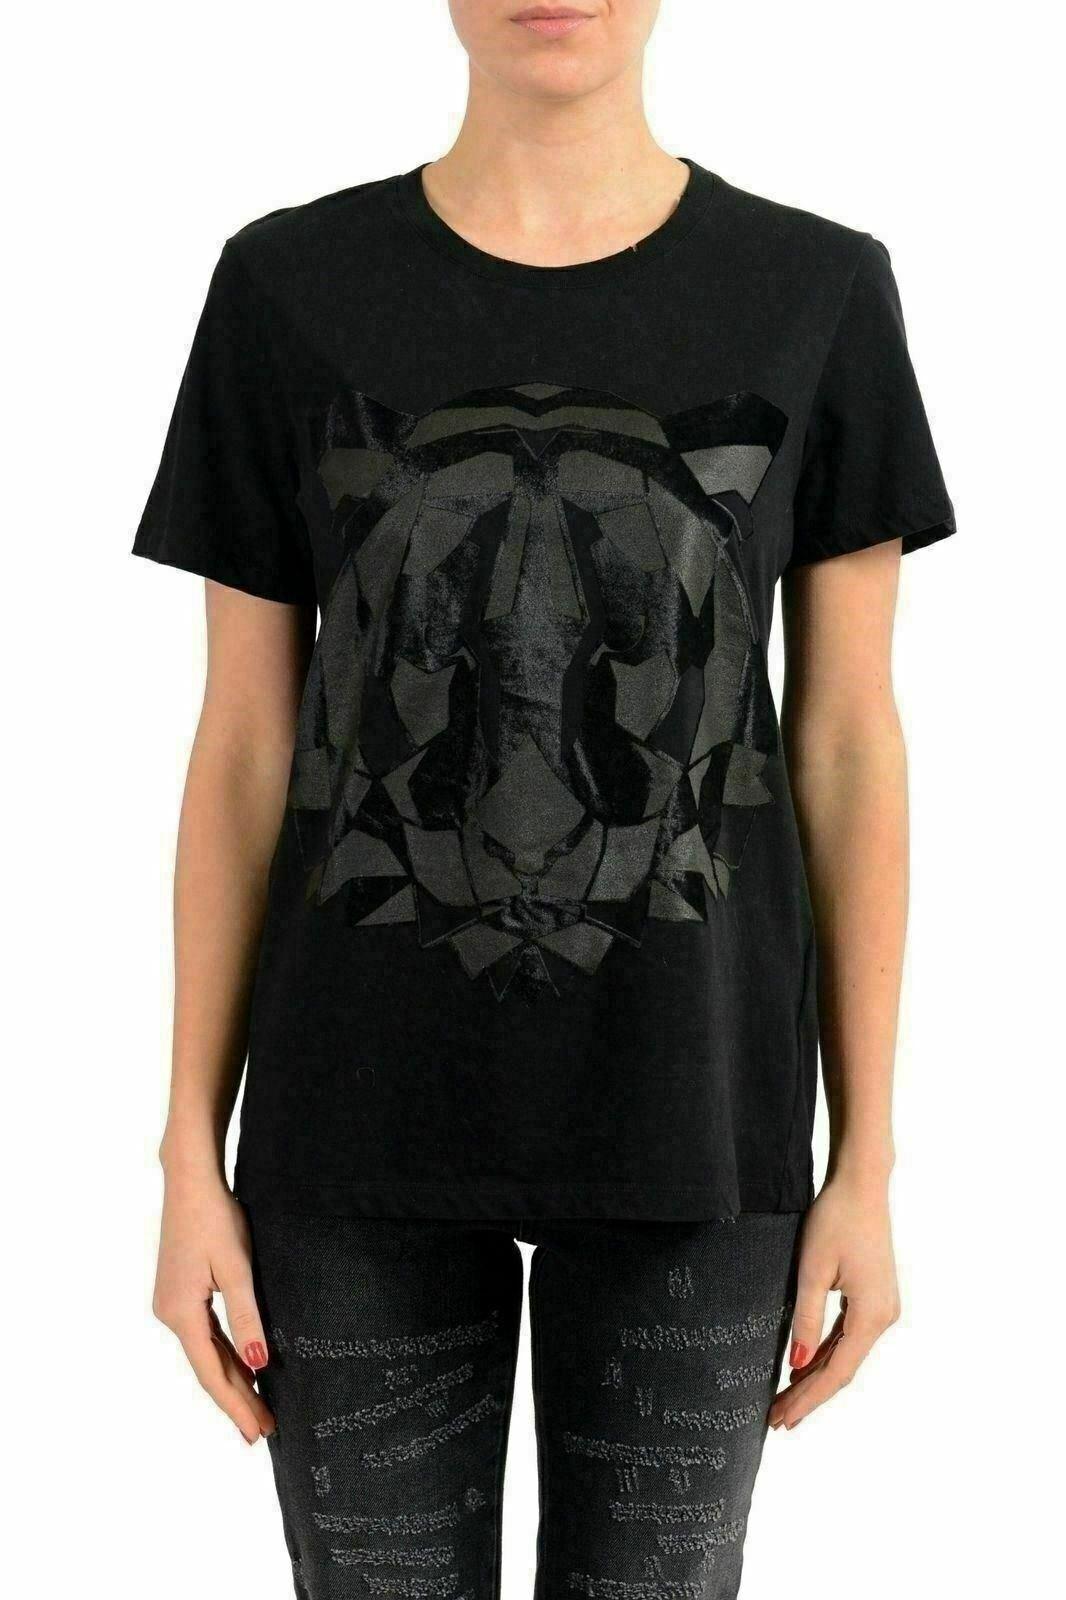 Just Cavalli Schwarz Grafik Kurzärmlig Damen T-Shirt US S It 40